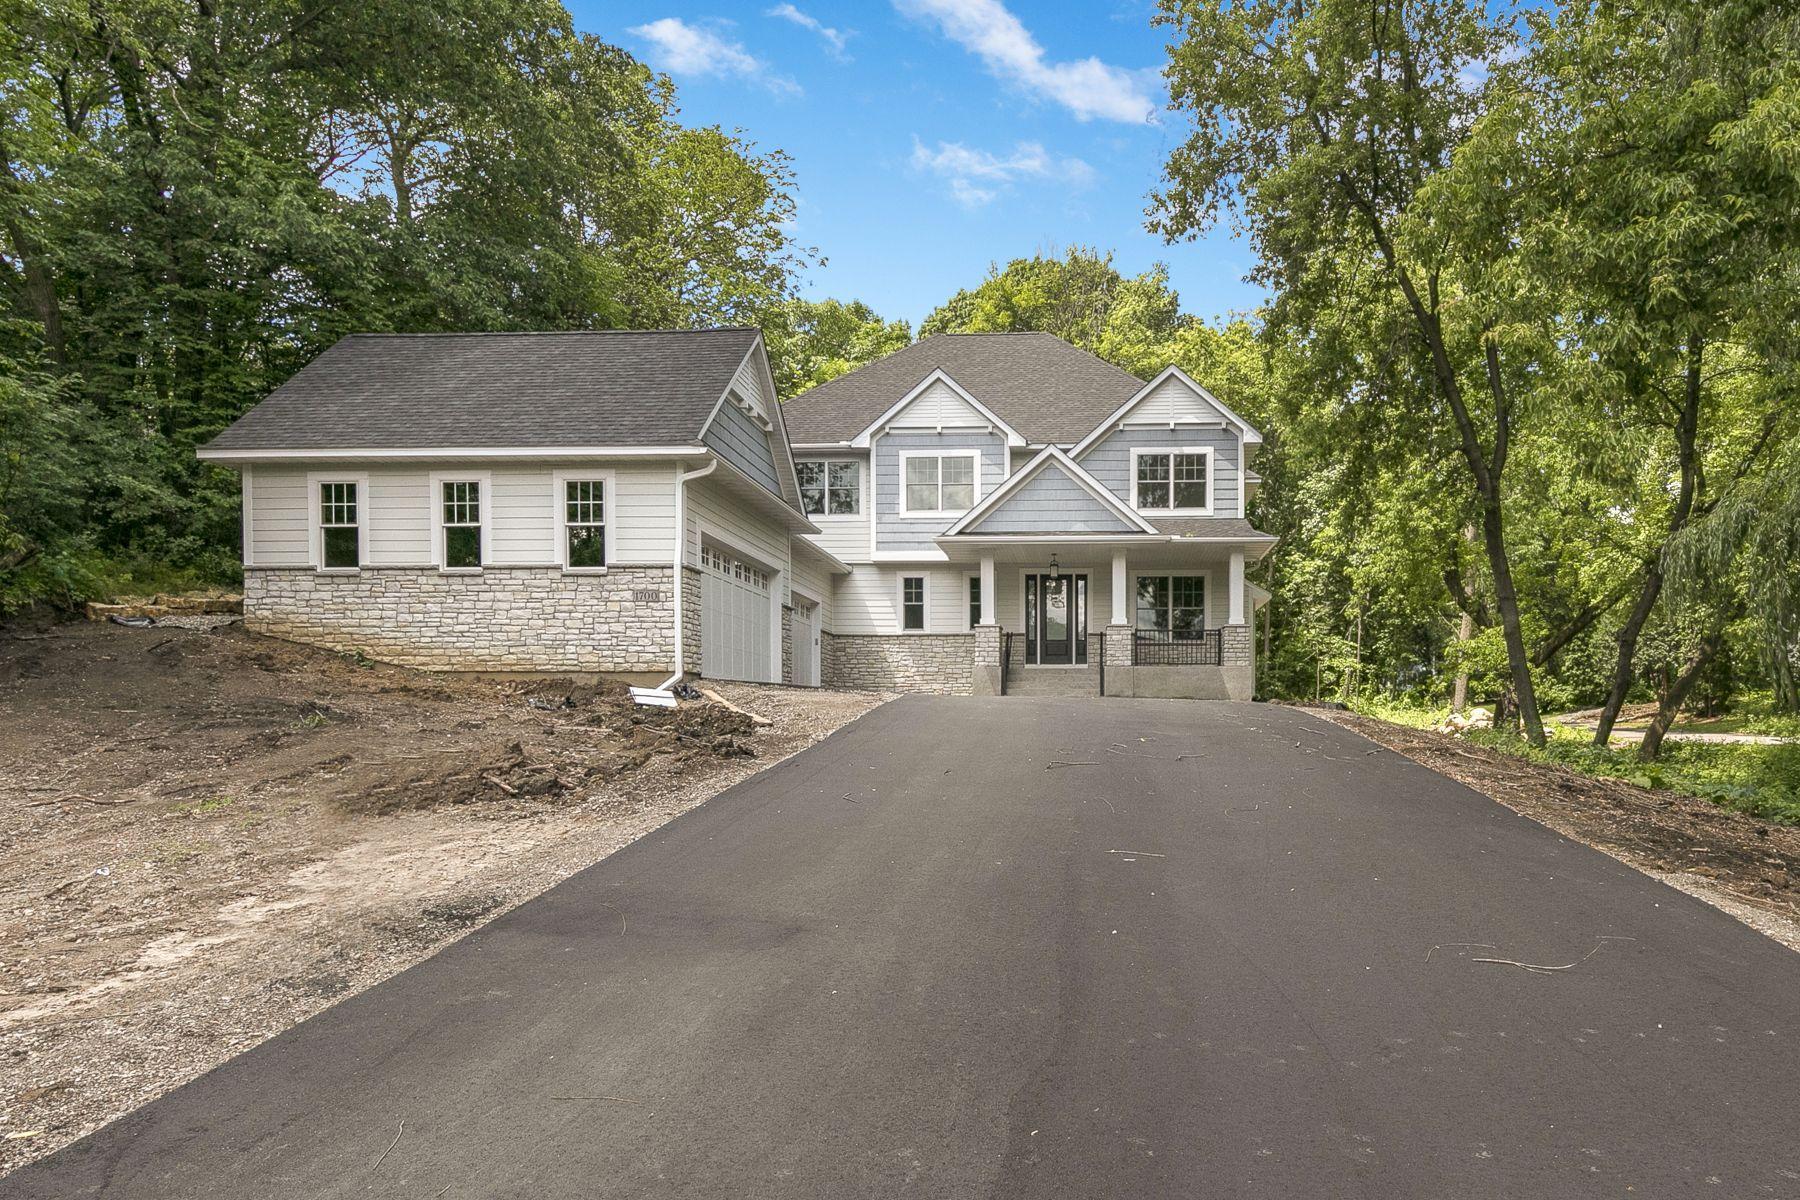 1700 Fairfield S Property Photo - Minnetonka, MN real estate listing